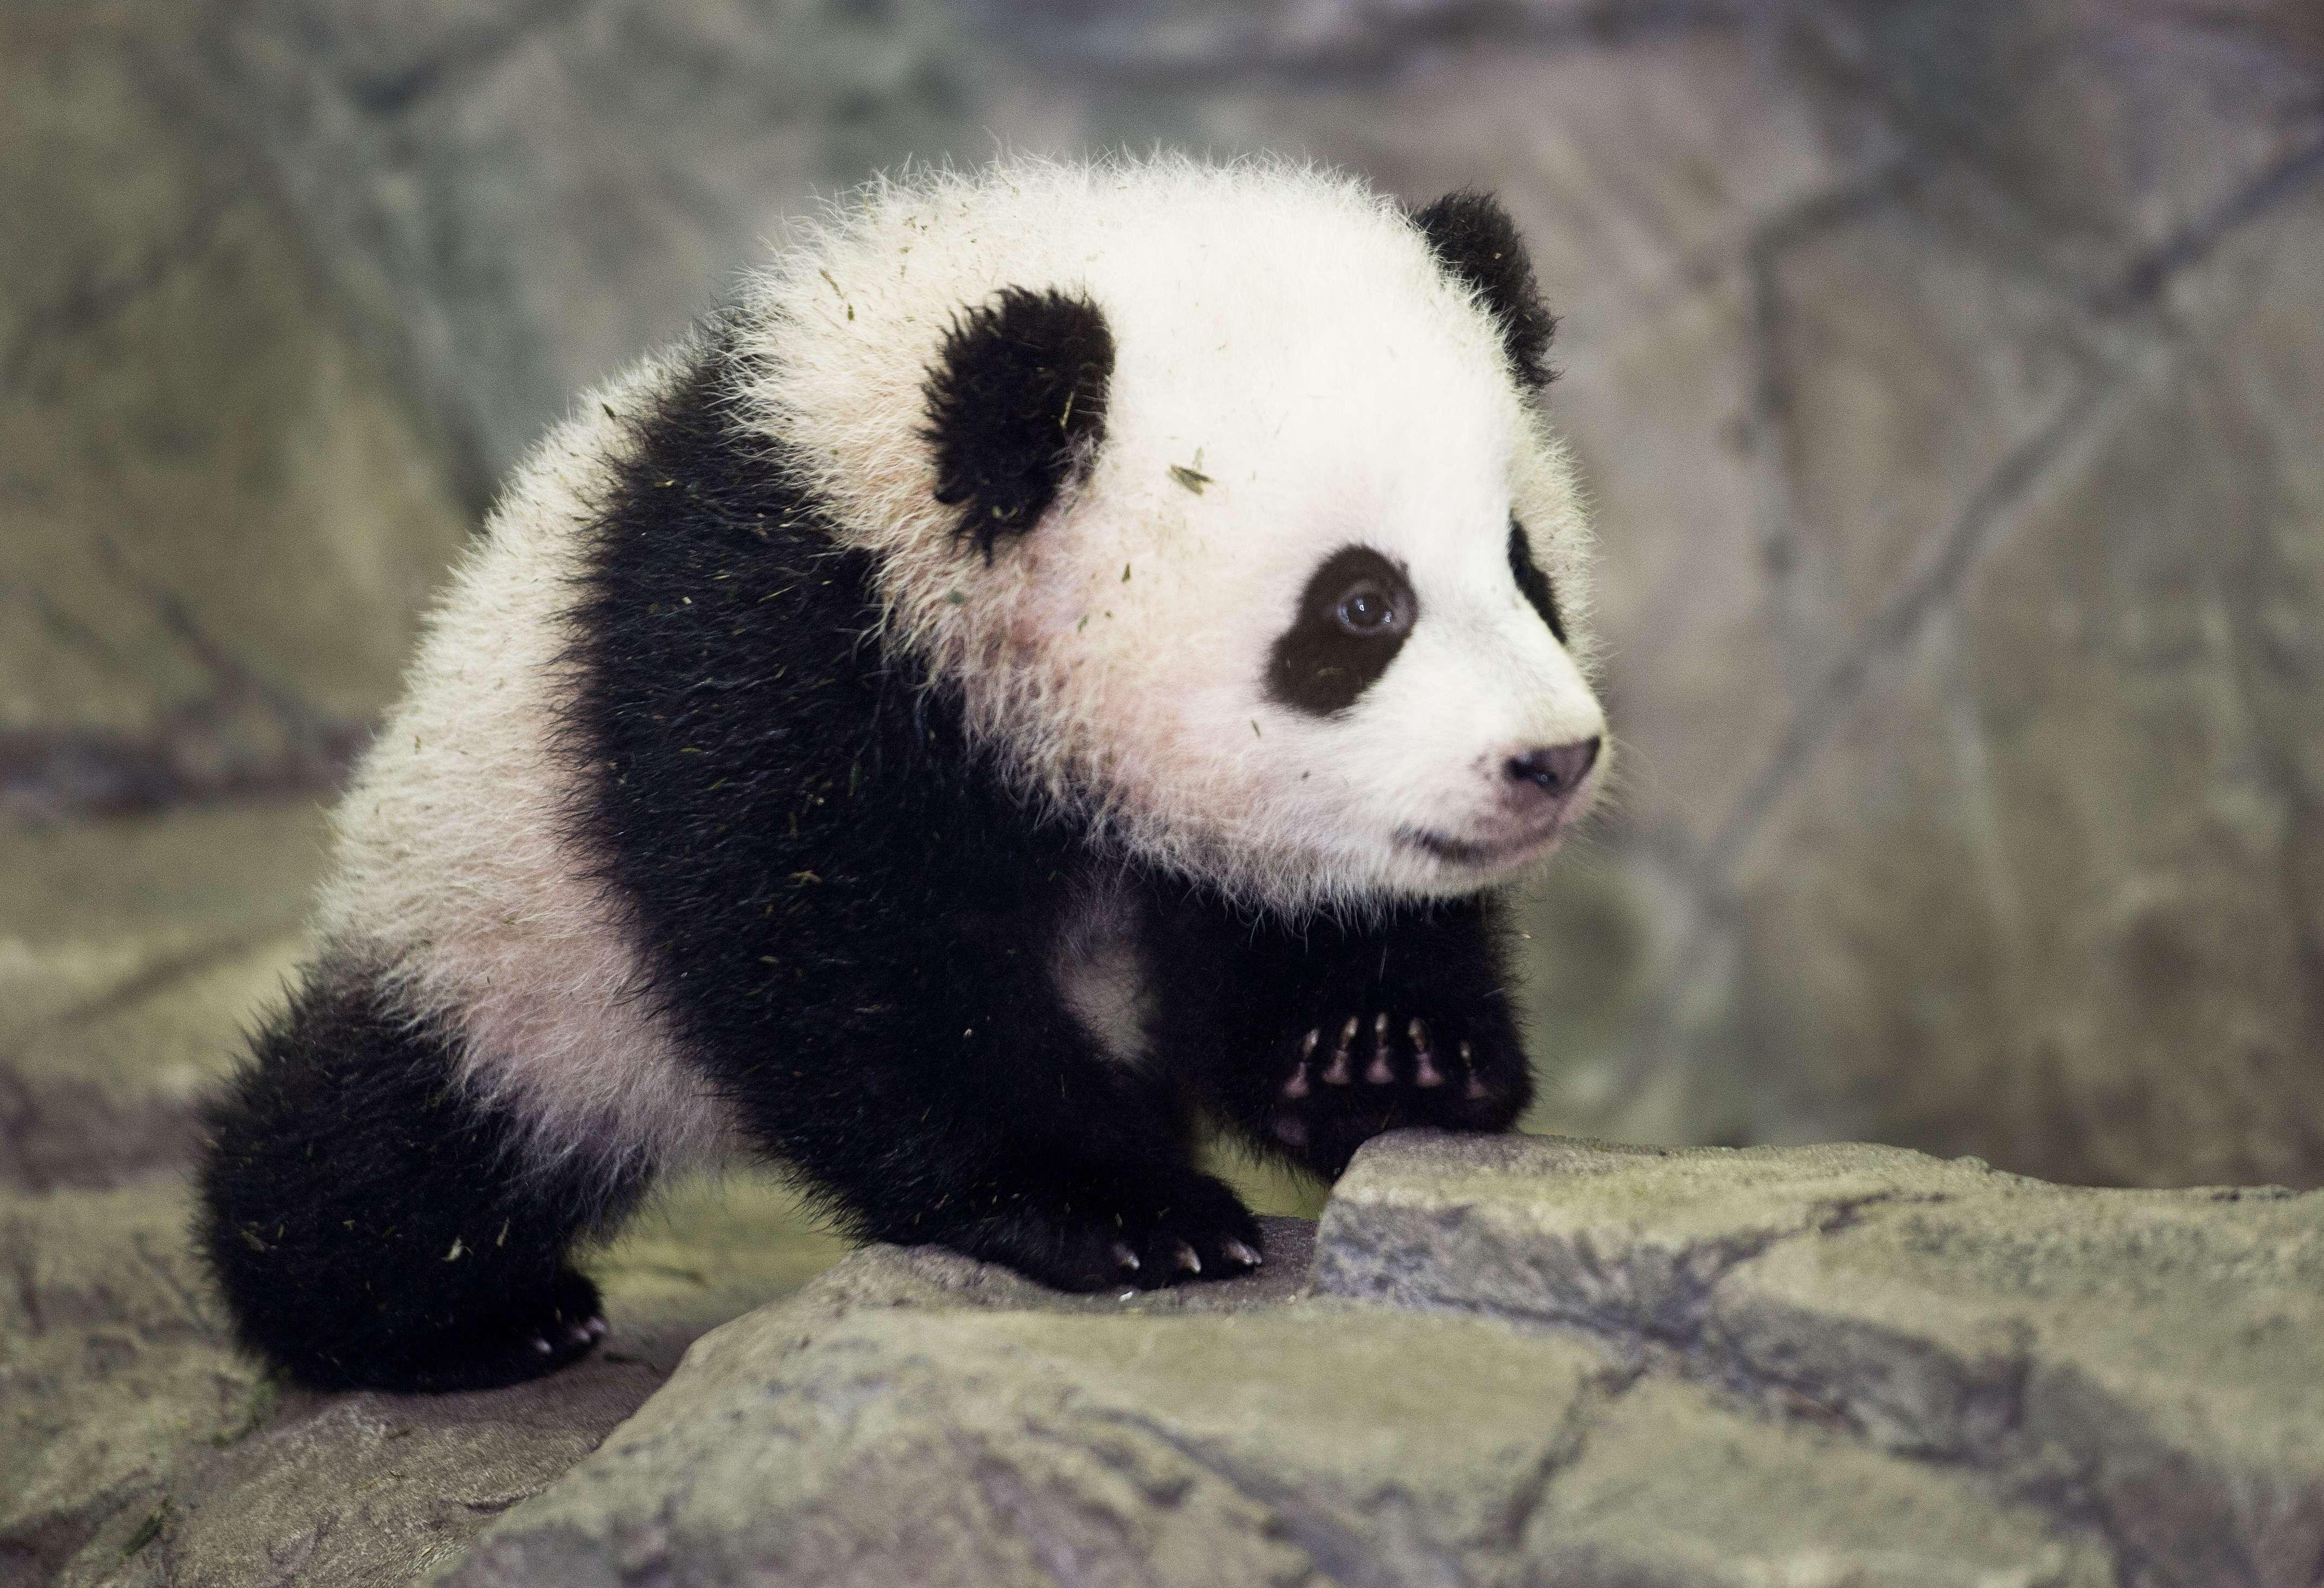 Gallery: Panda cubs Bao Bao and Yuan Zai make public debuts at Washington and Taipei City Zoos